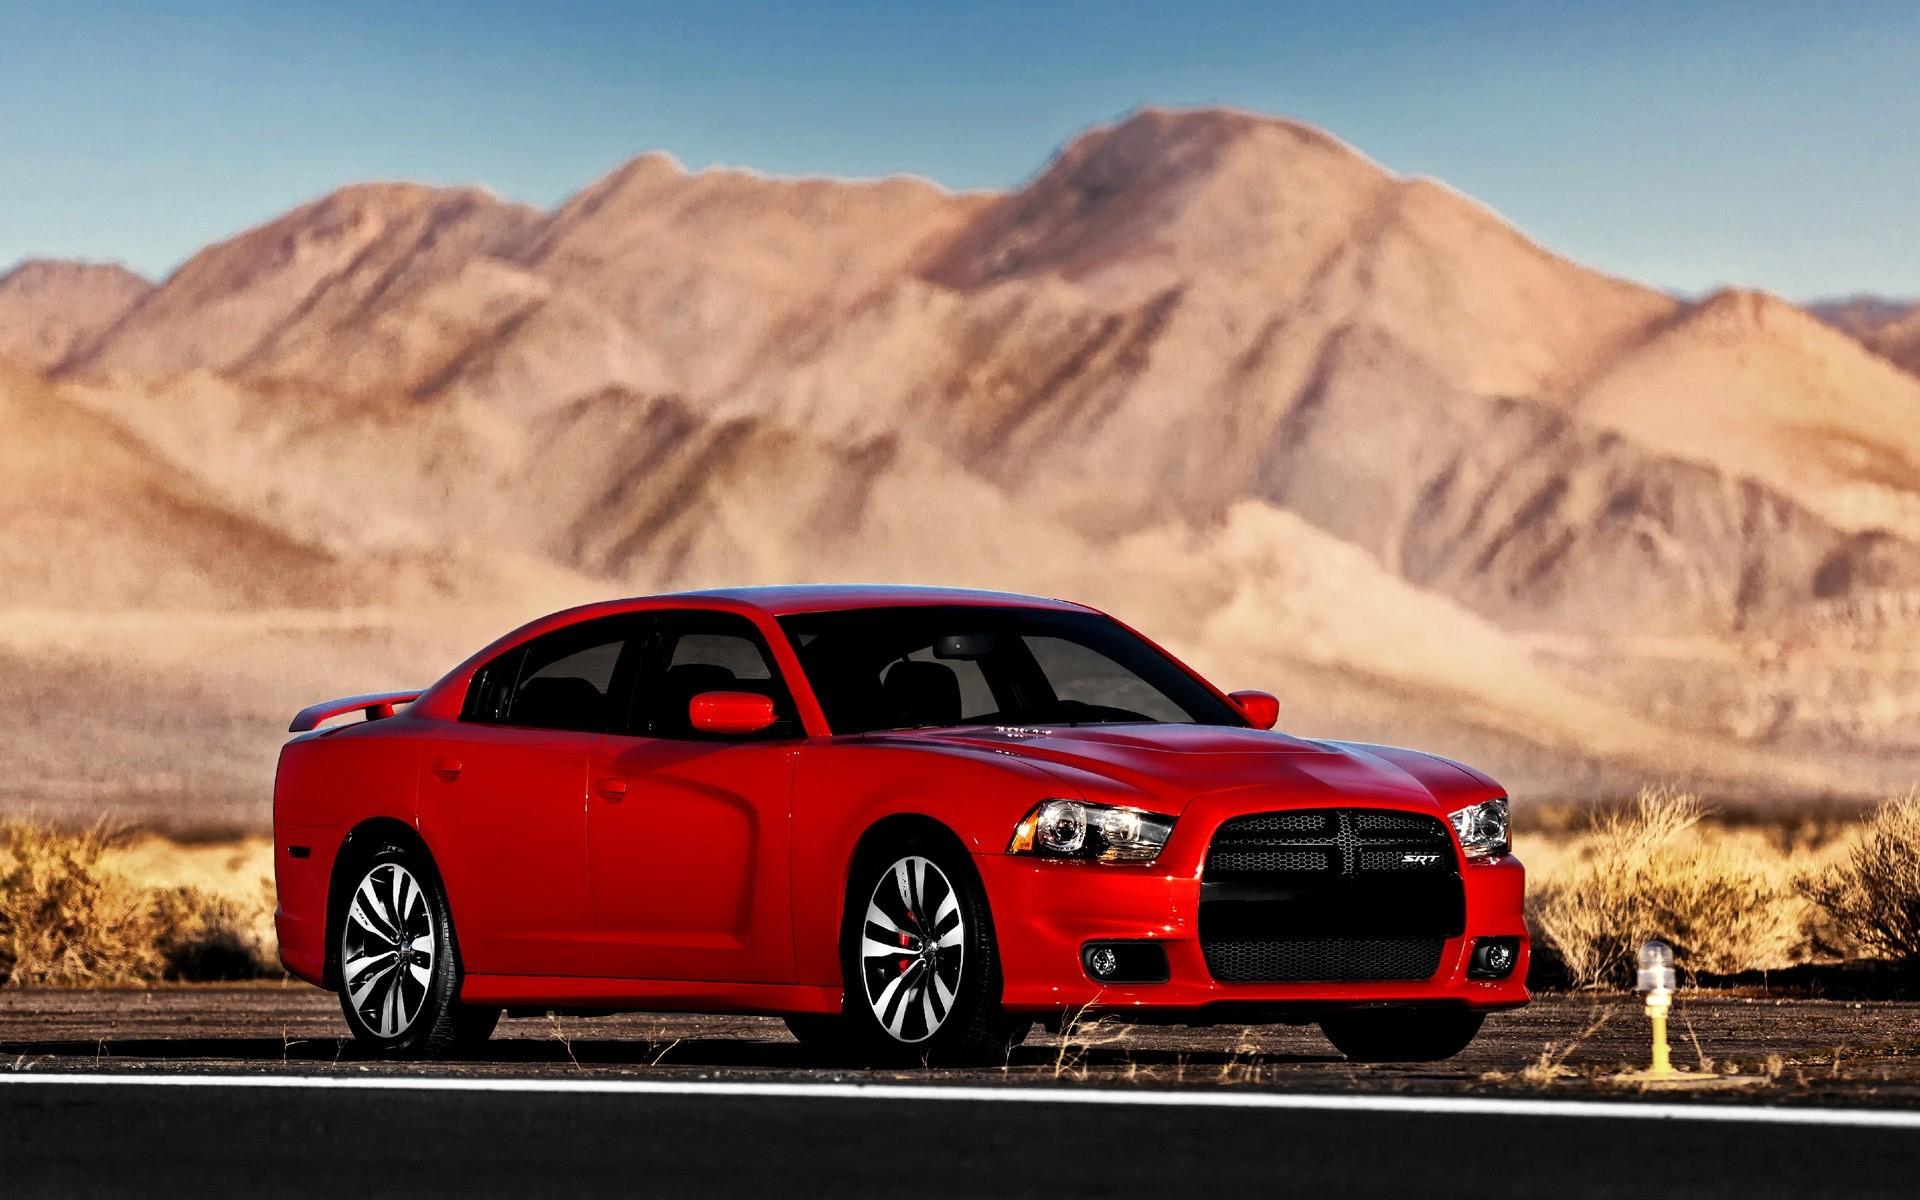 Dodge charger srt8  № 3813431 бесплатно